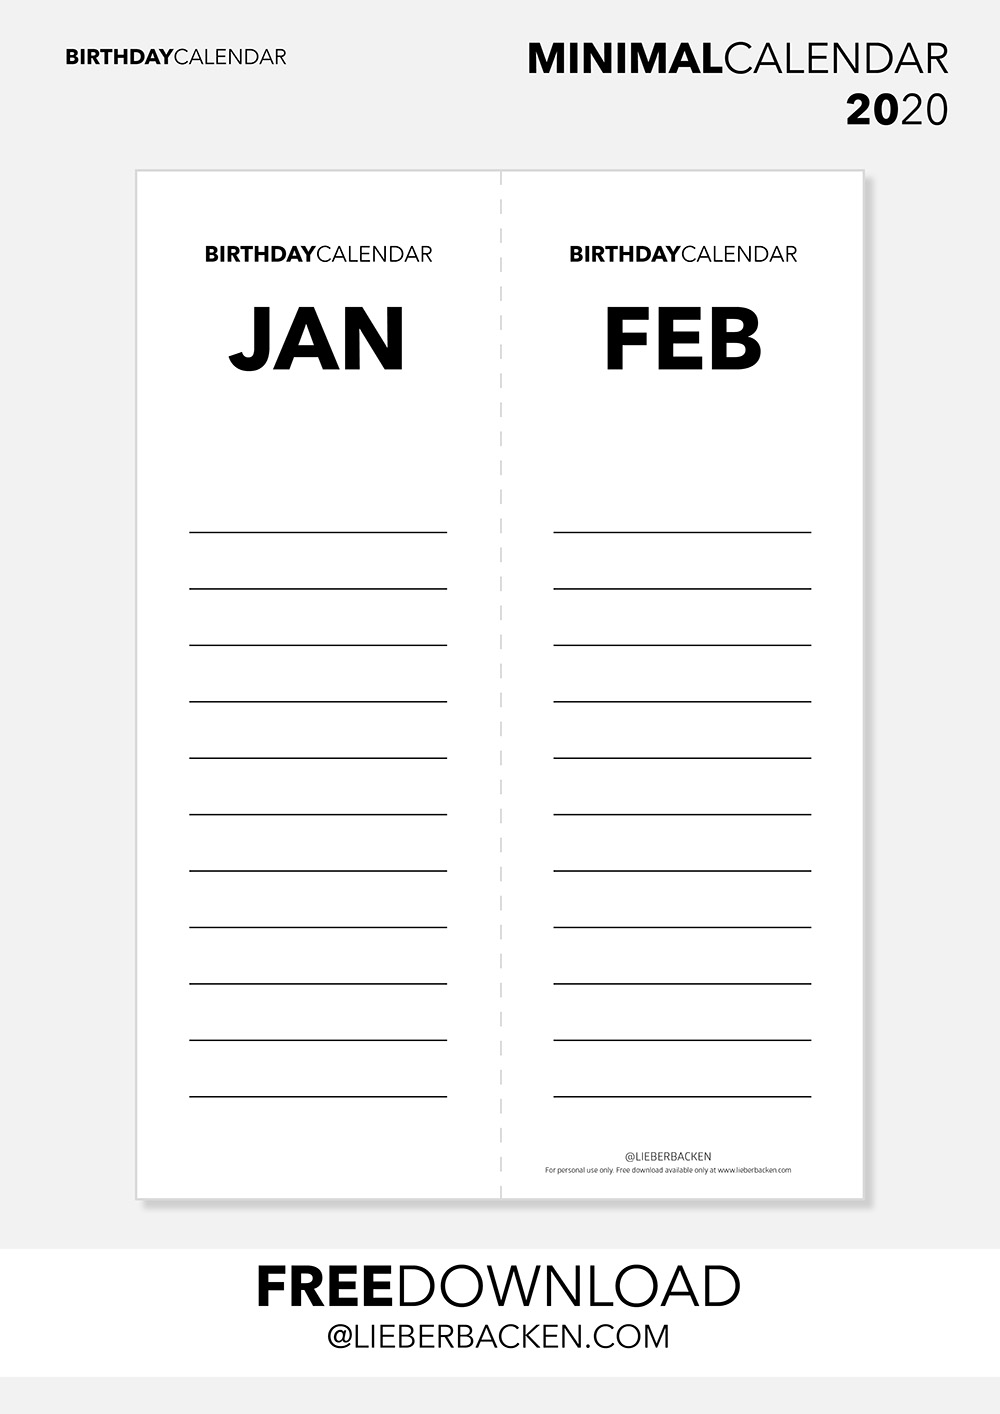 Birthday Calender - Free Printable Calender Bundle | Gratis Download Geburtstagskalender | Kostenfreier PDF Download